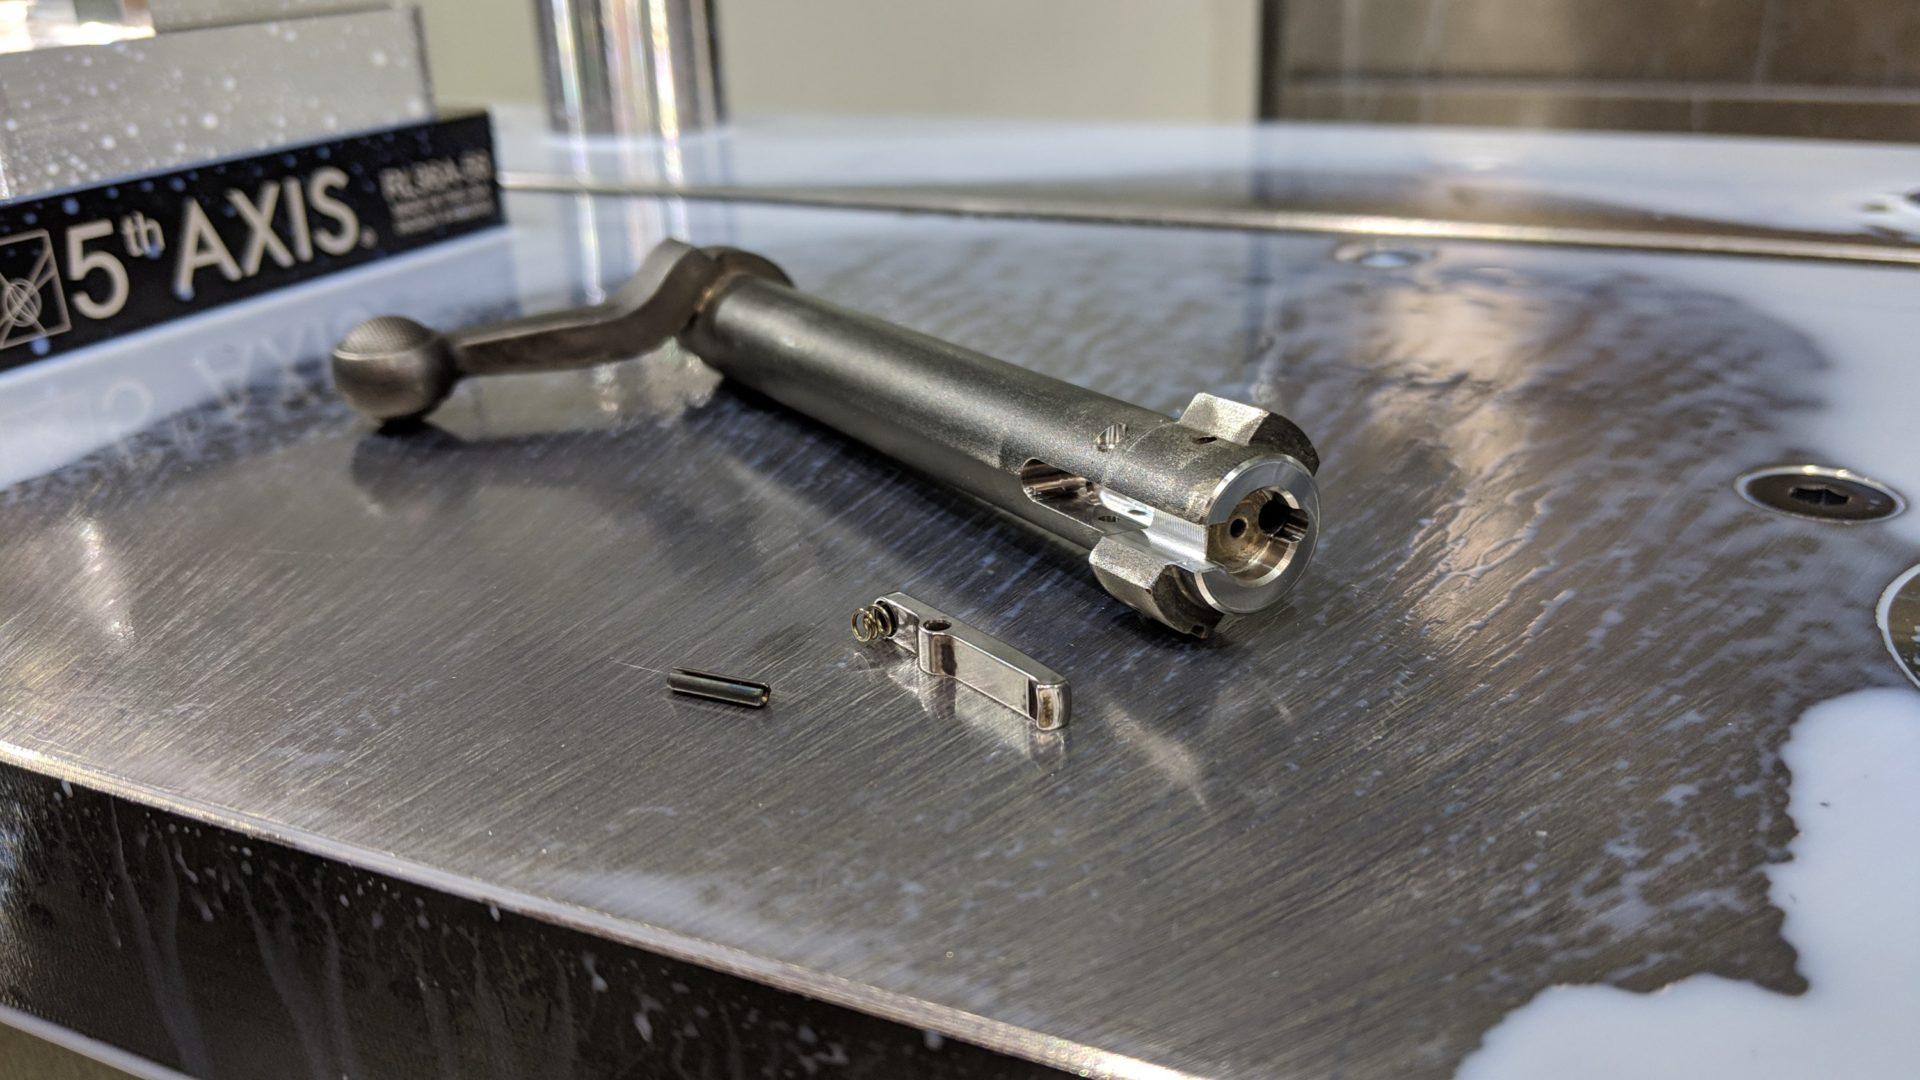 M16 Extractor Upgrade